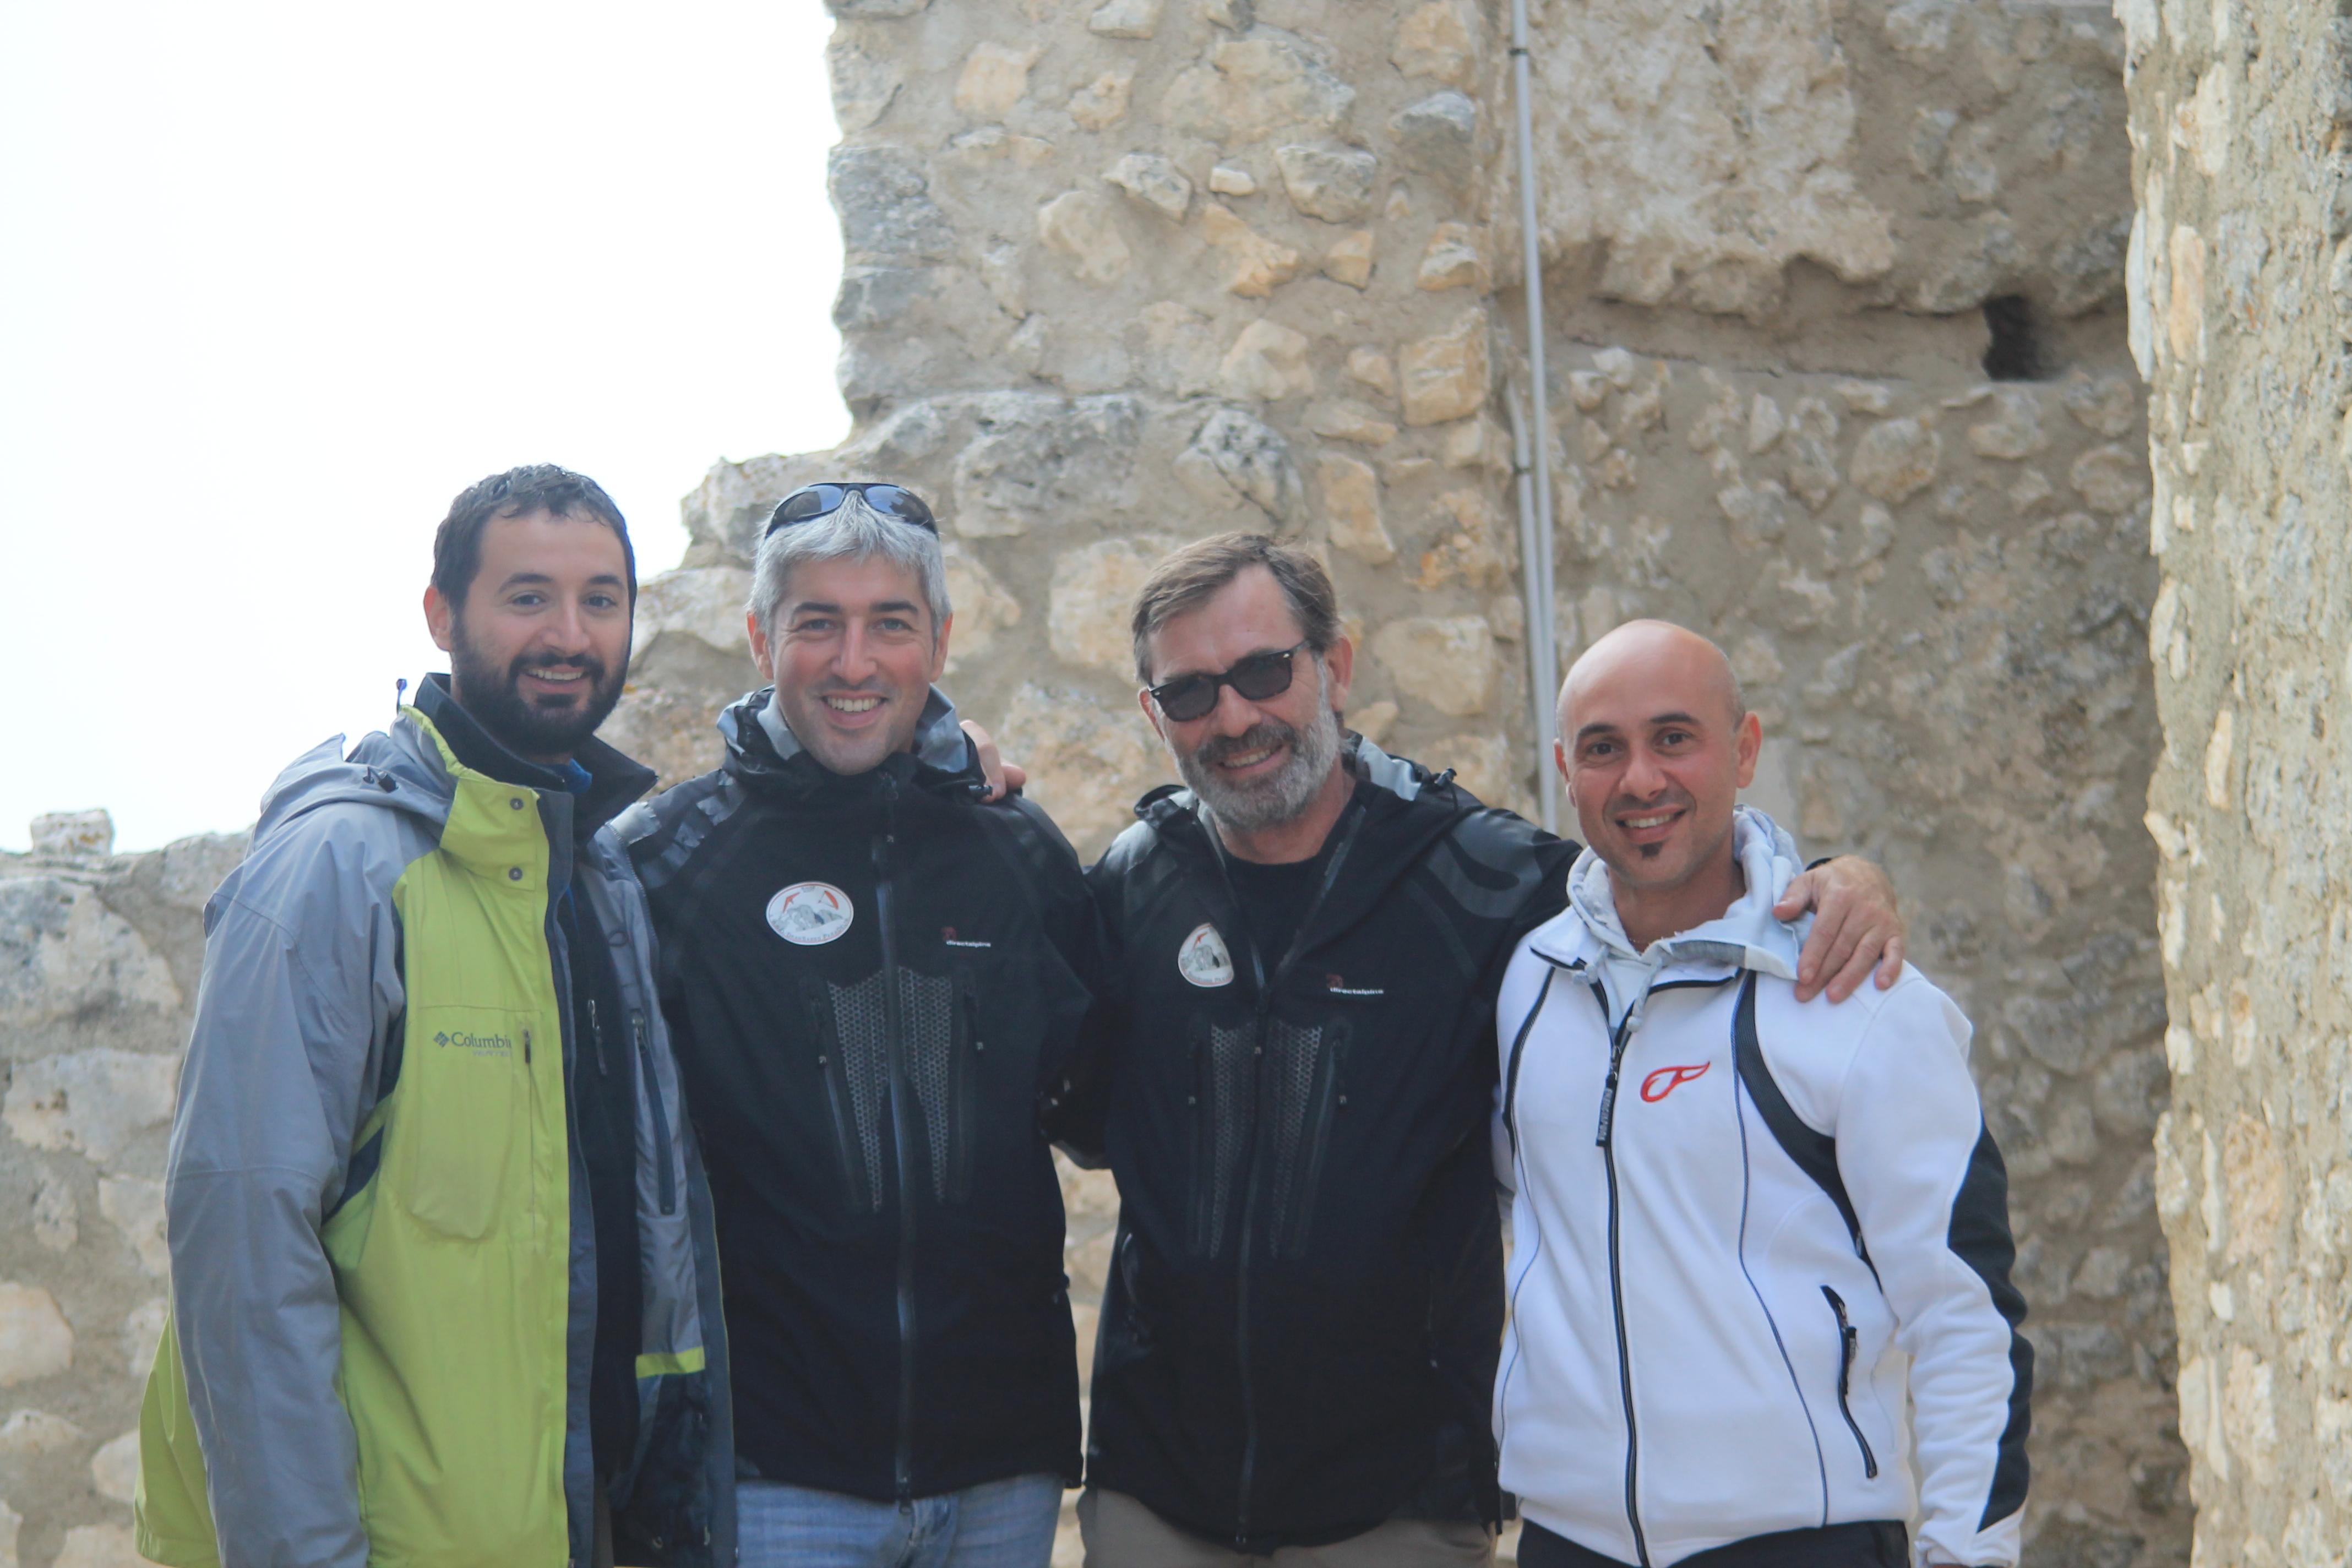 Maurizio, Mauro, Antonio, Giulio